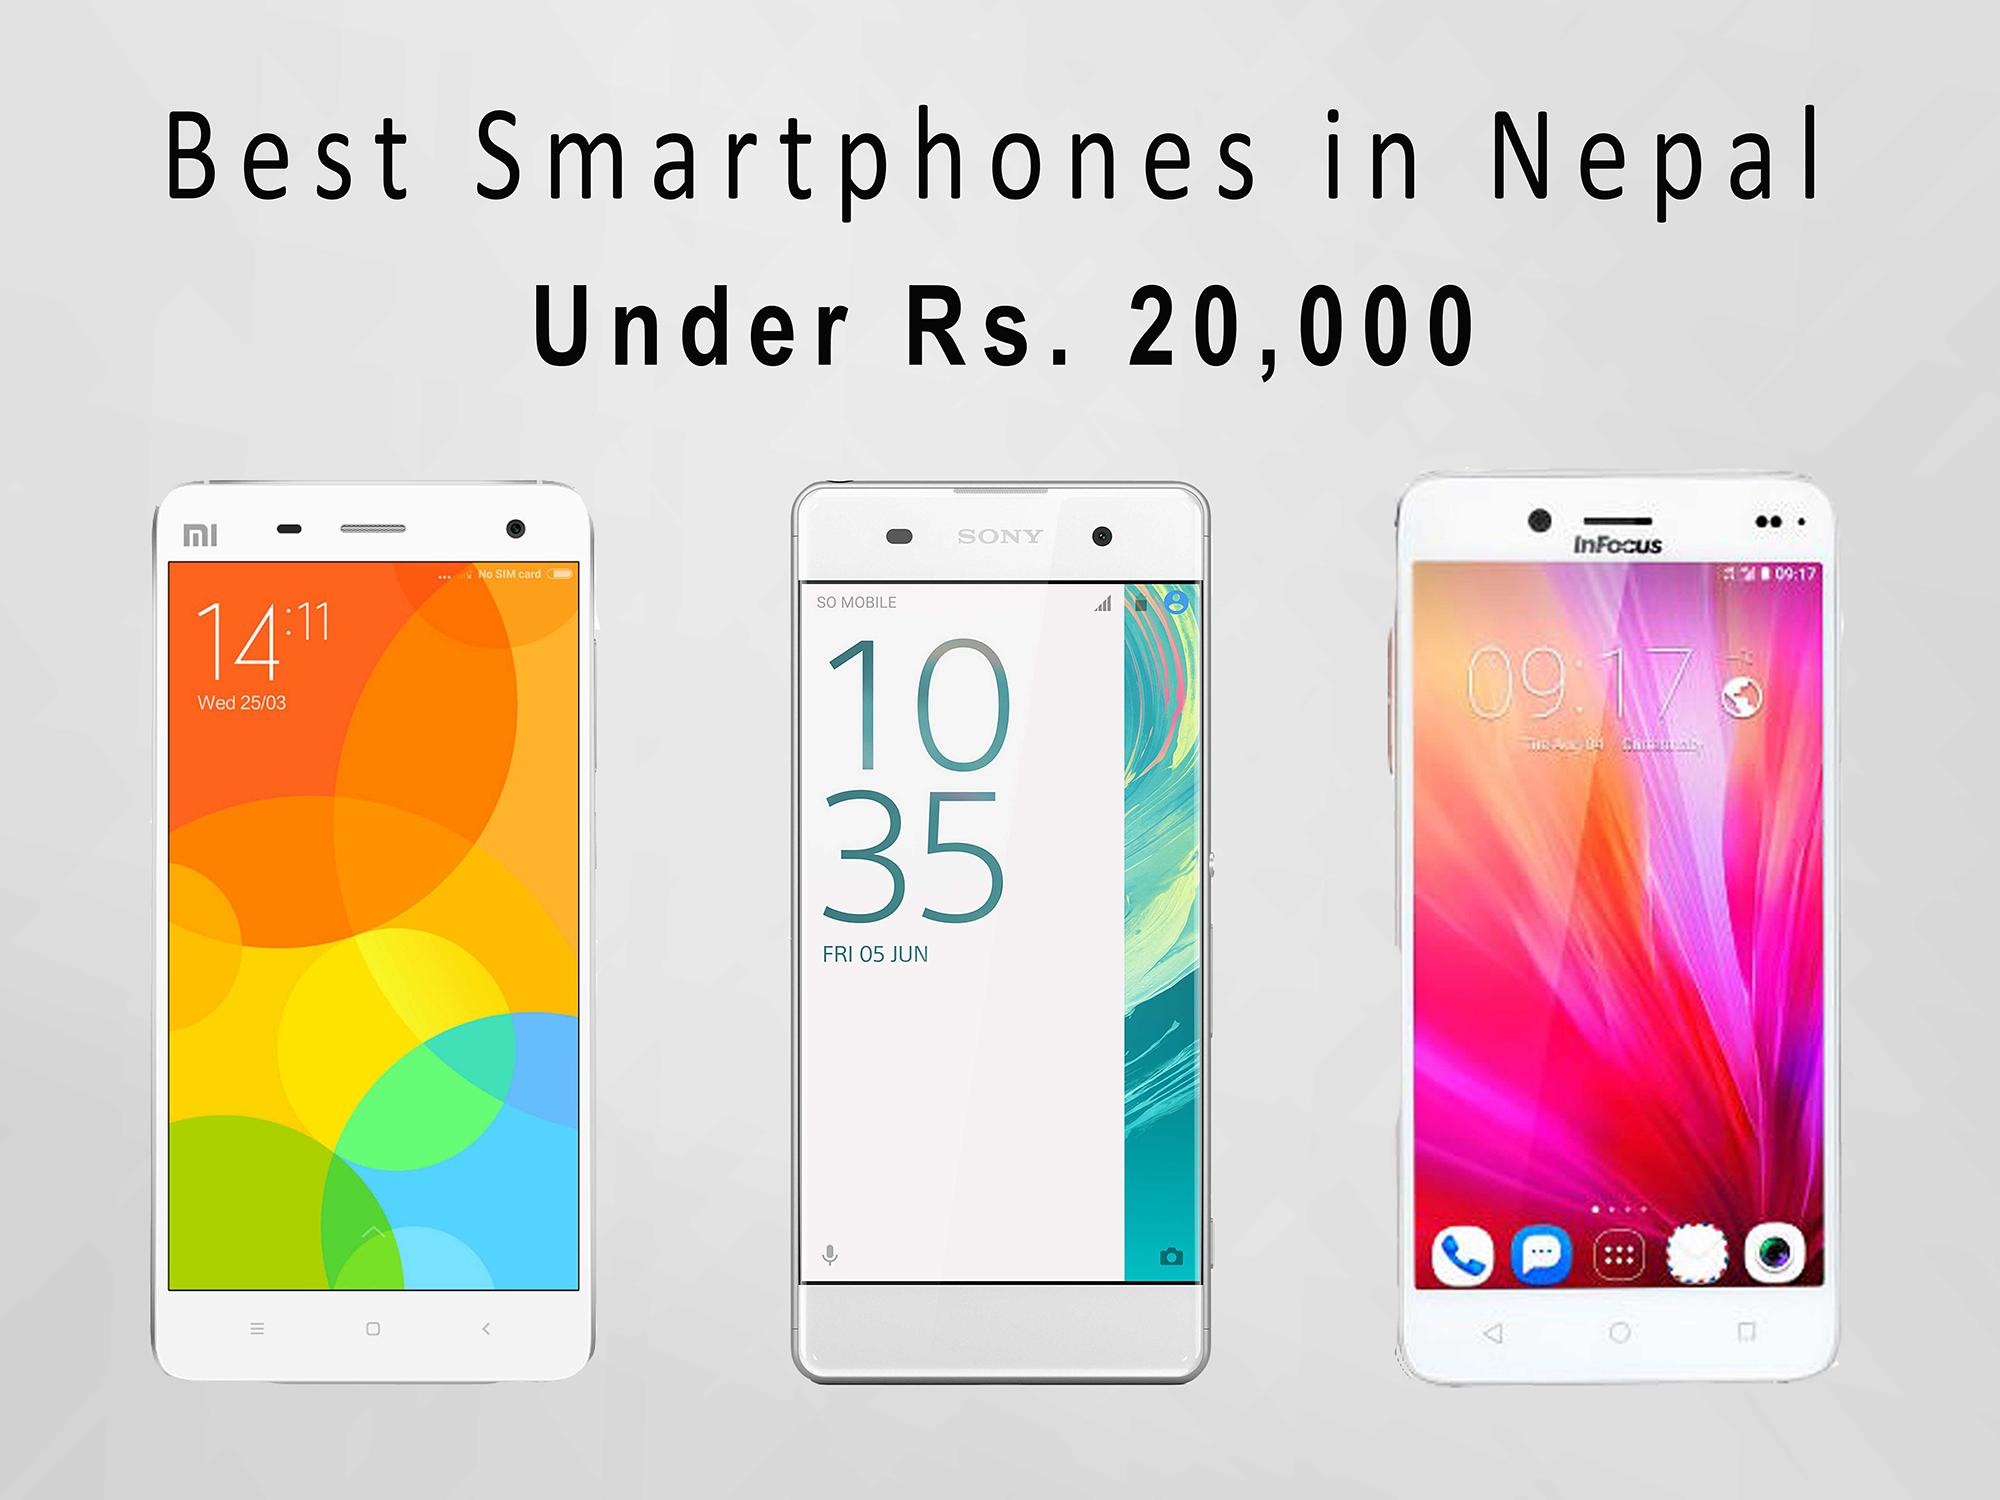 best phones under rs.20,000 in nepal